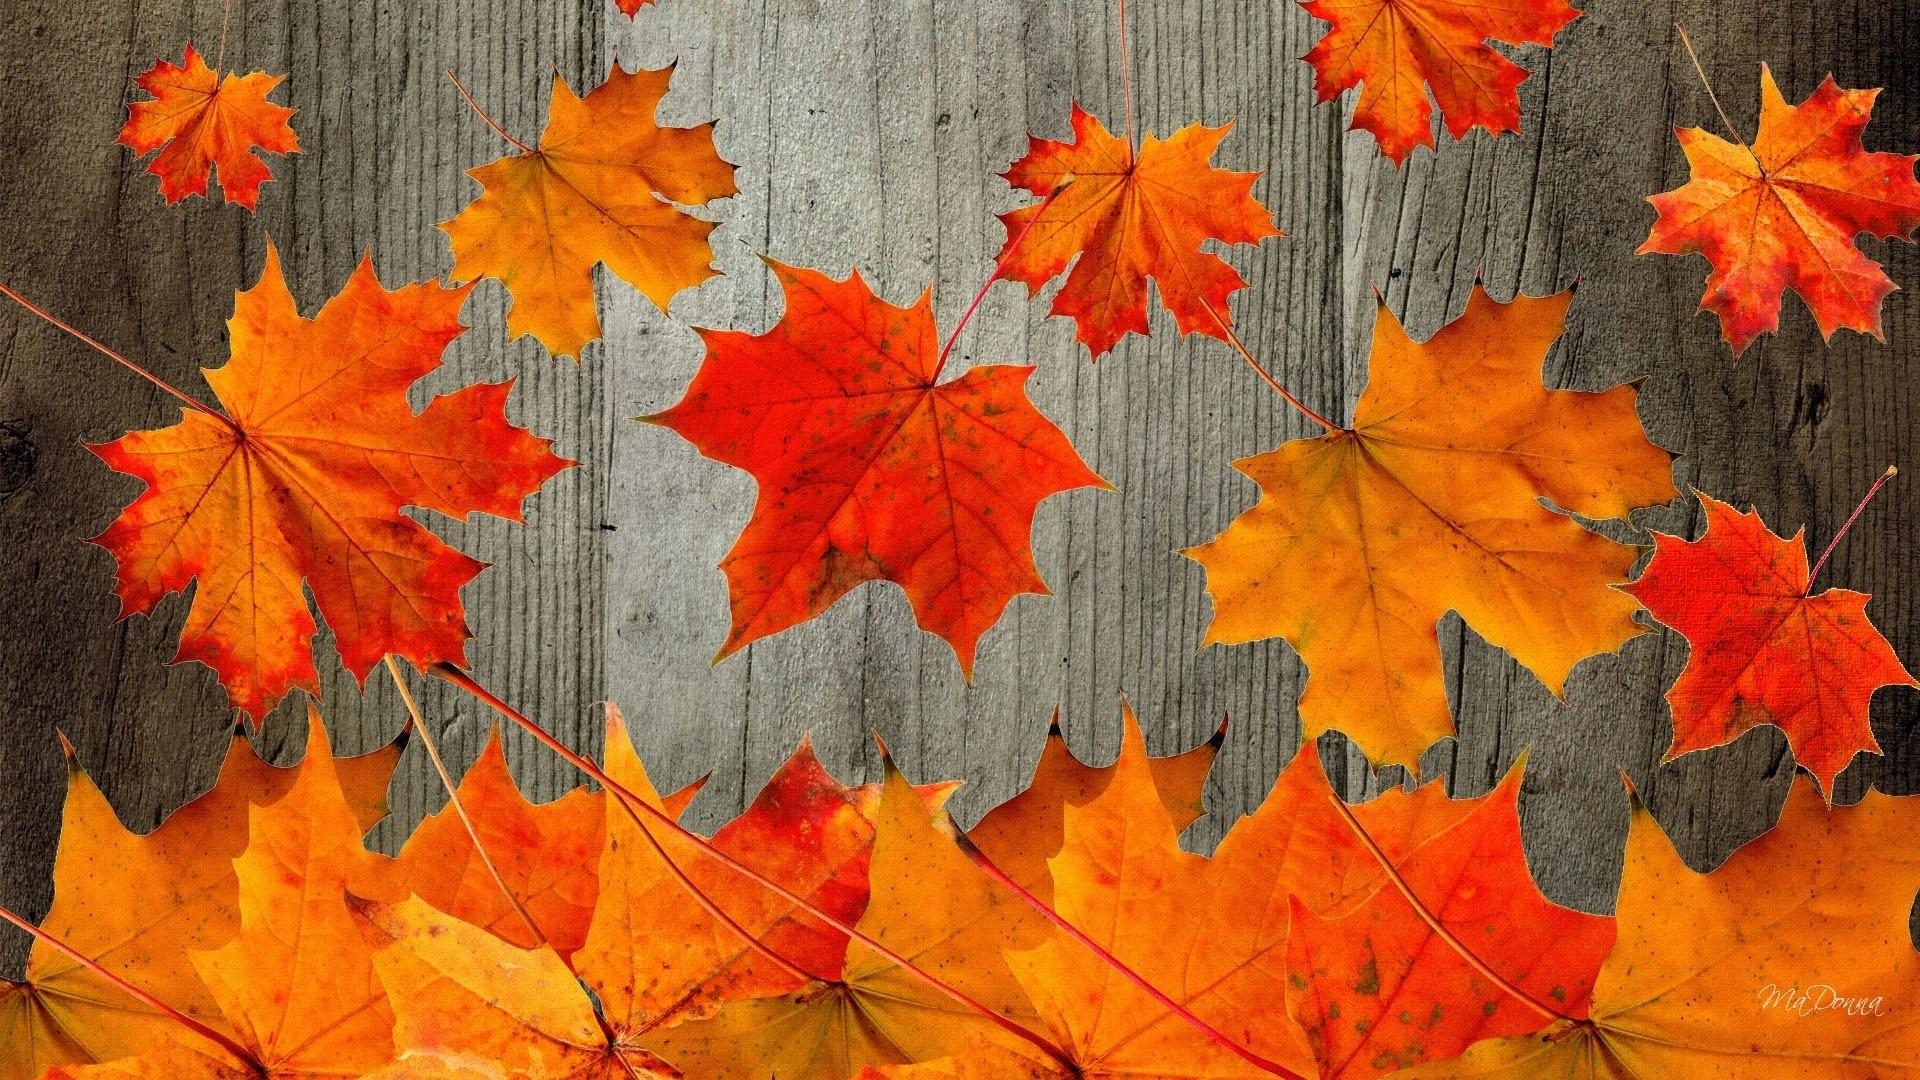 Free Fall Wallpapers For Desktop9   Data Src - Fall Desktop Backgrounds - HD Wallpaper